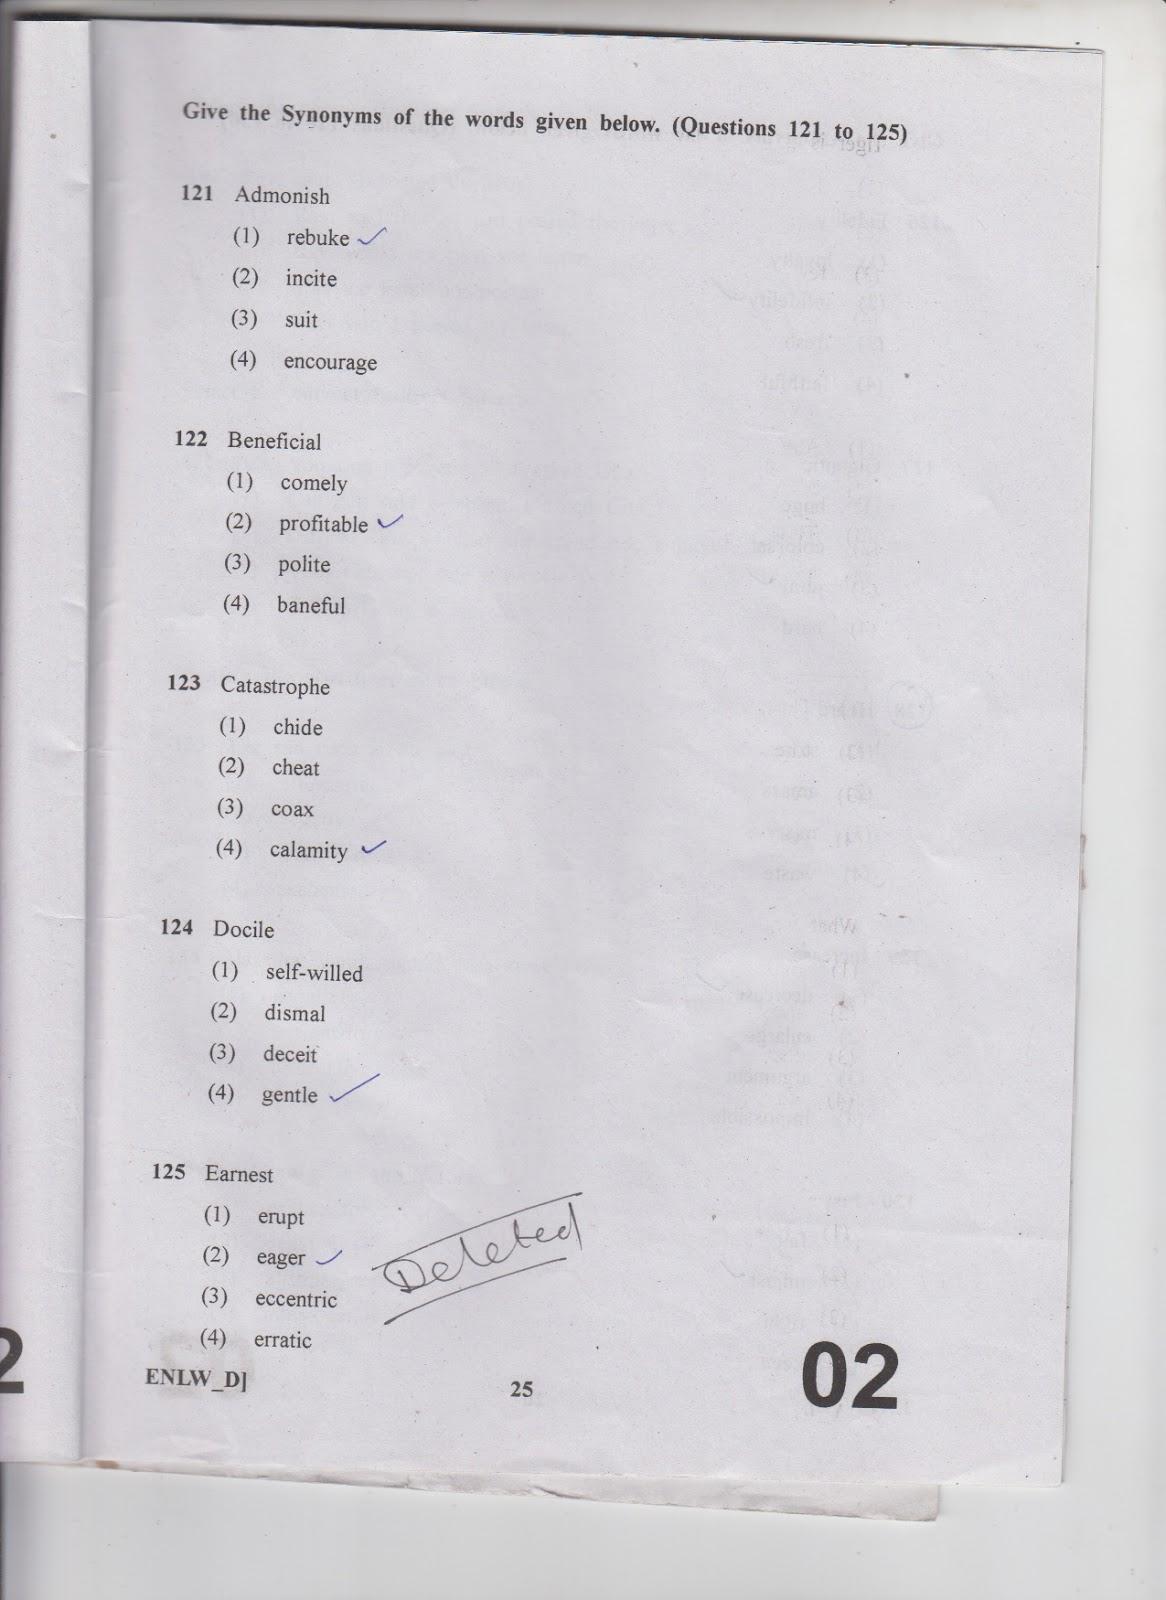 ONLINE GK FOR YOU: RPSC LDC EXAM PAPER 2011, RPSC LDC EXAM